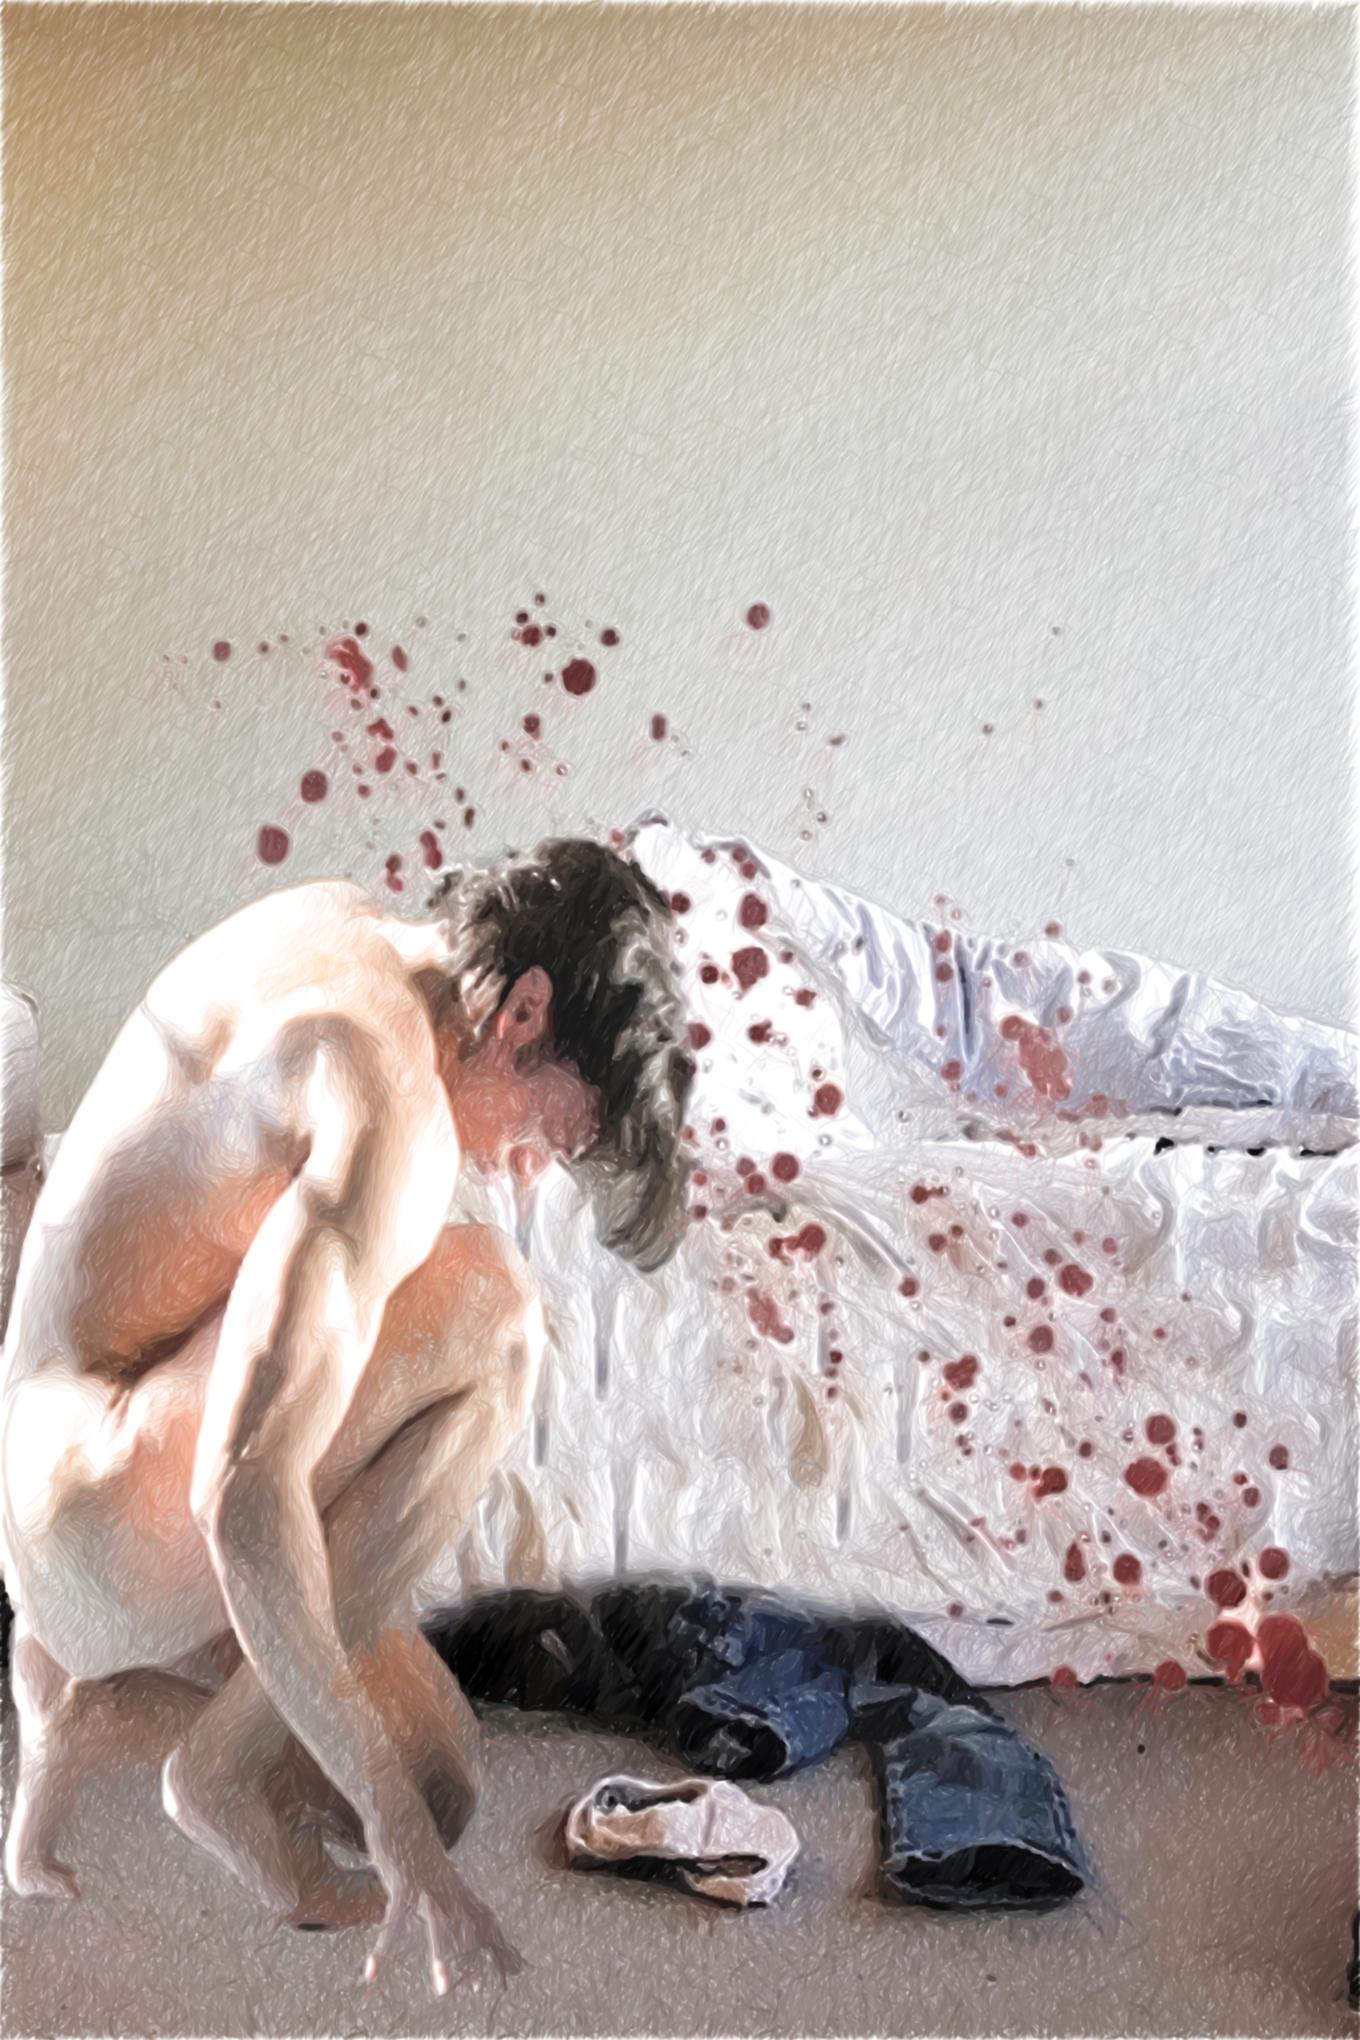 Junger Mann vor bett mit doppeltem blut-groß meticulous